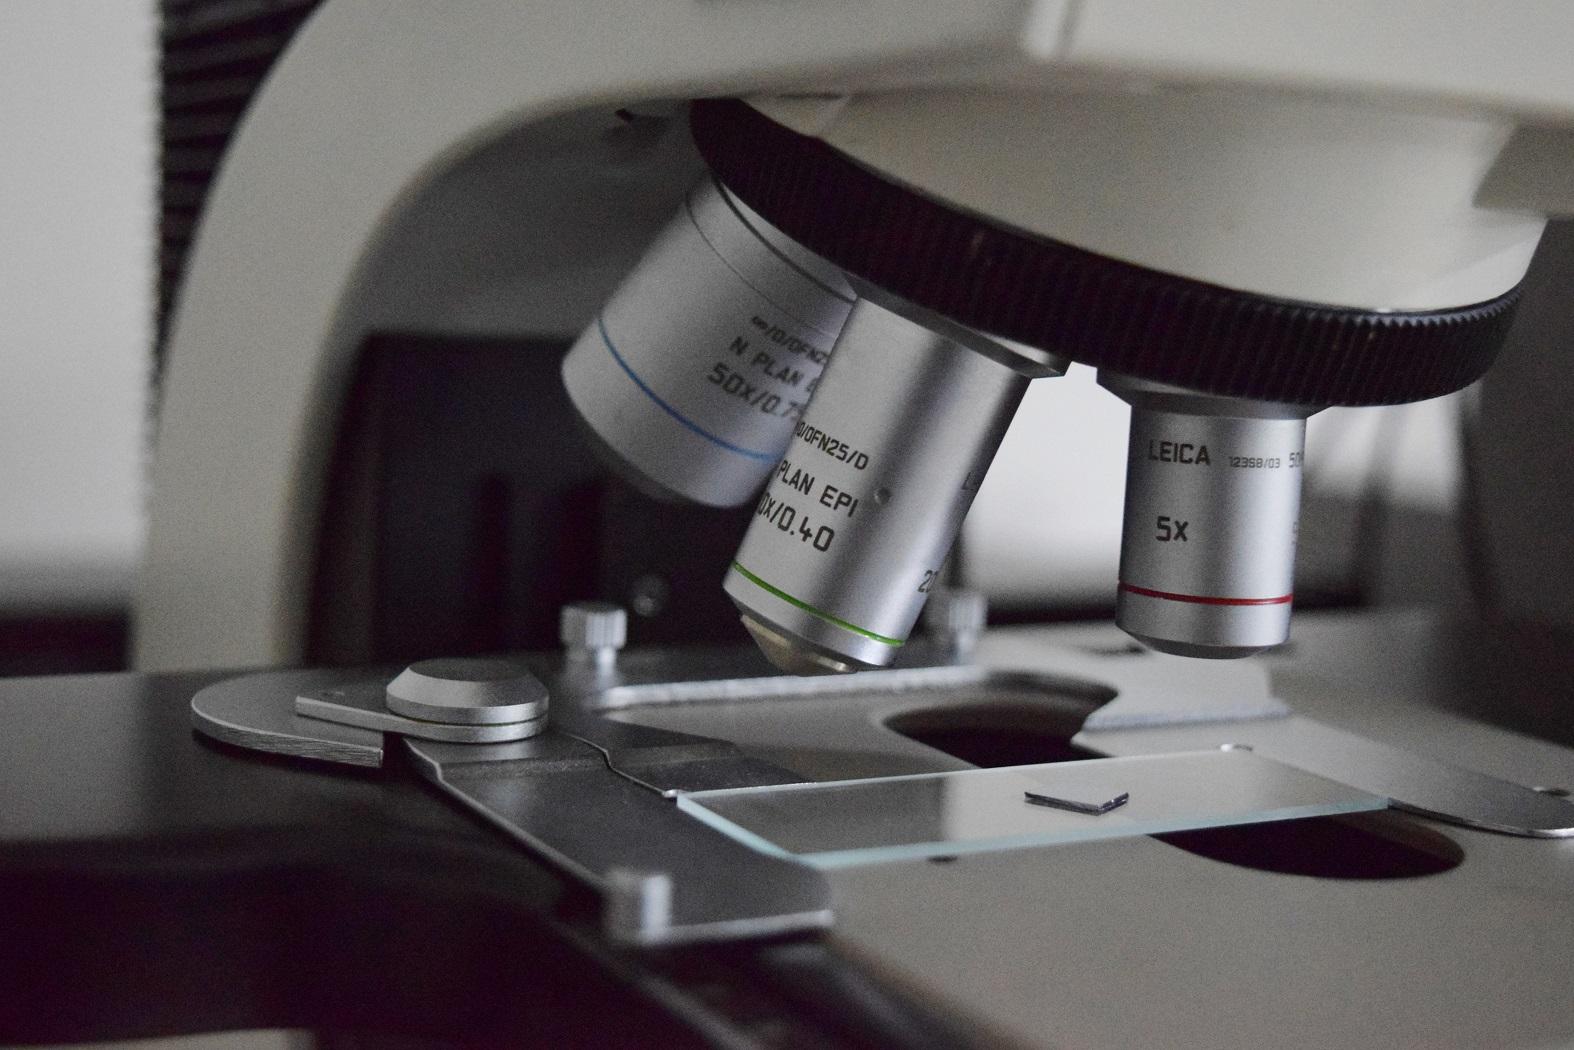 parenteral medication spectrometry